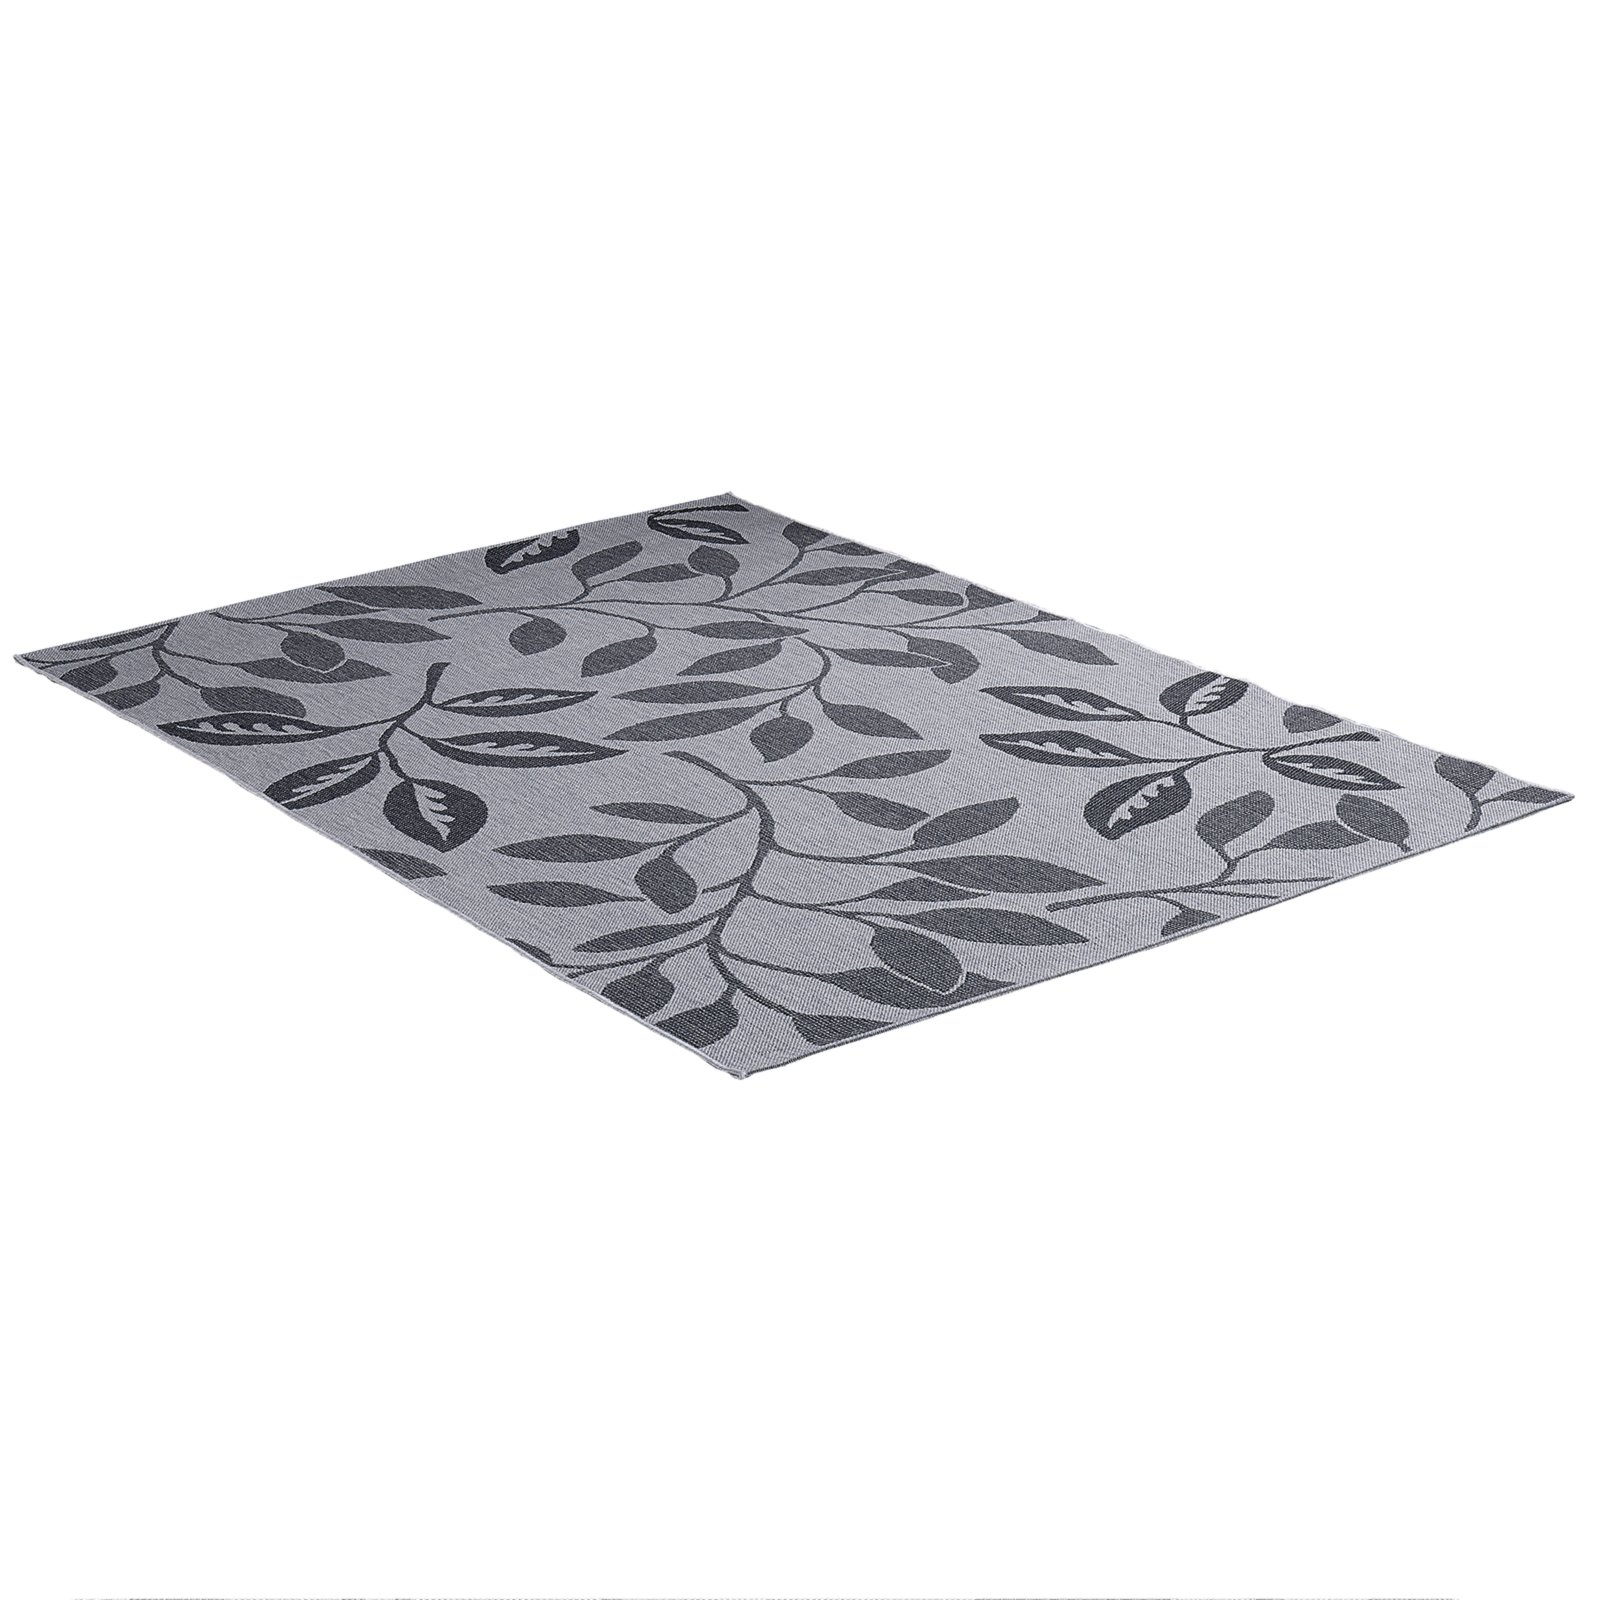 in outdoorteppich oslo grau bl tter 160x230 cm ebay. Black Bedroom Furniture Sets. Home Design Ideas